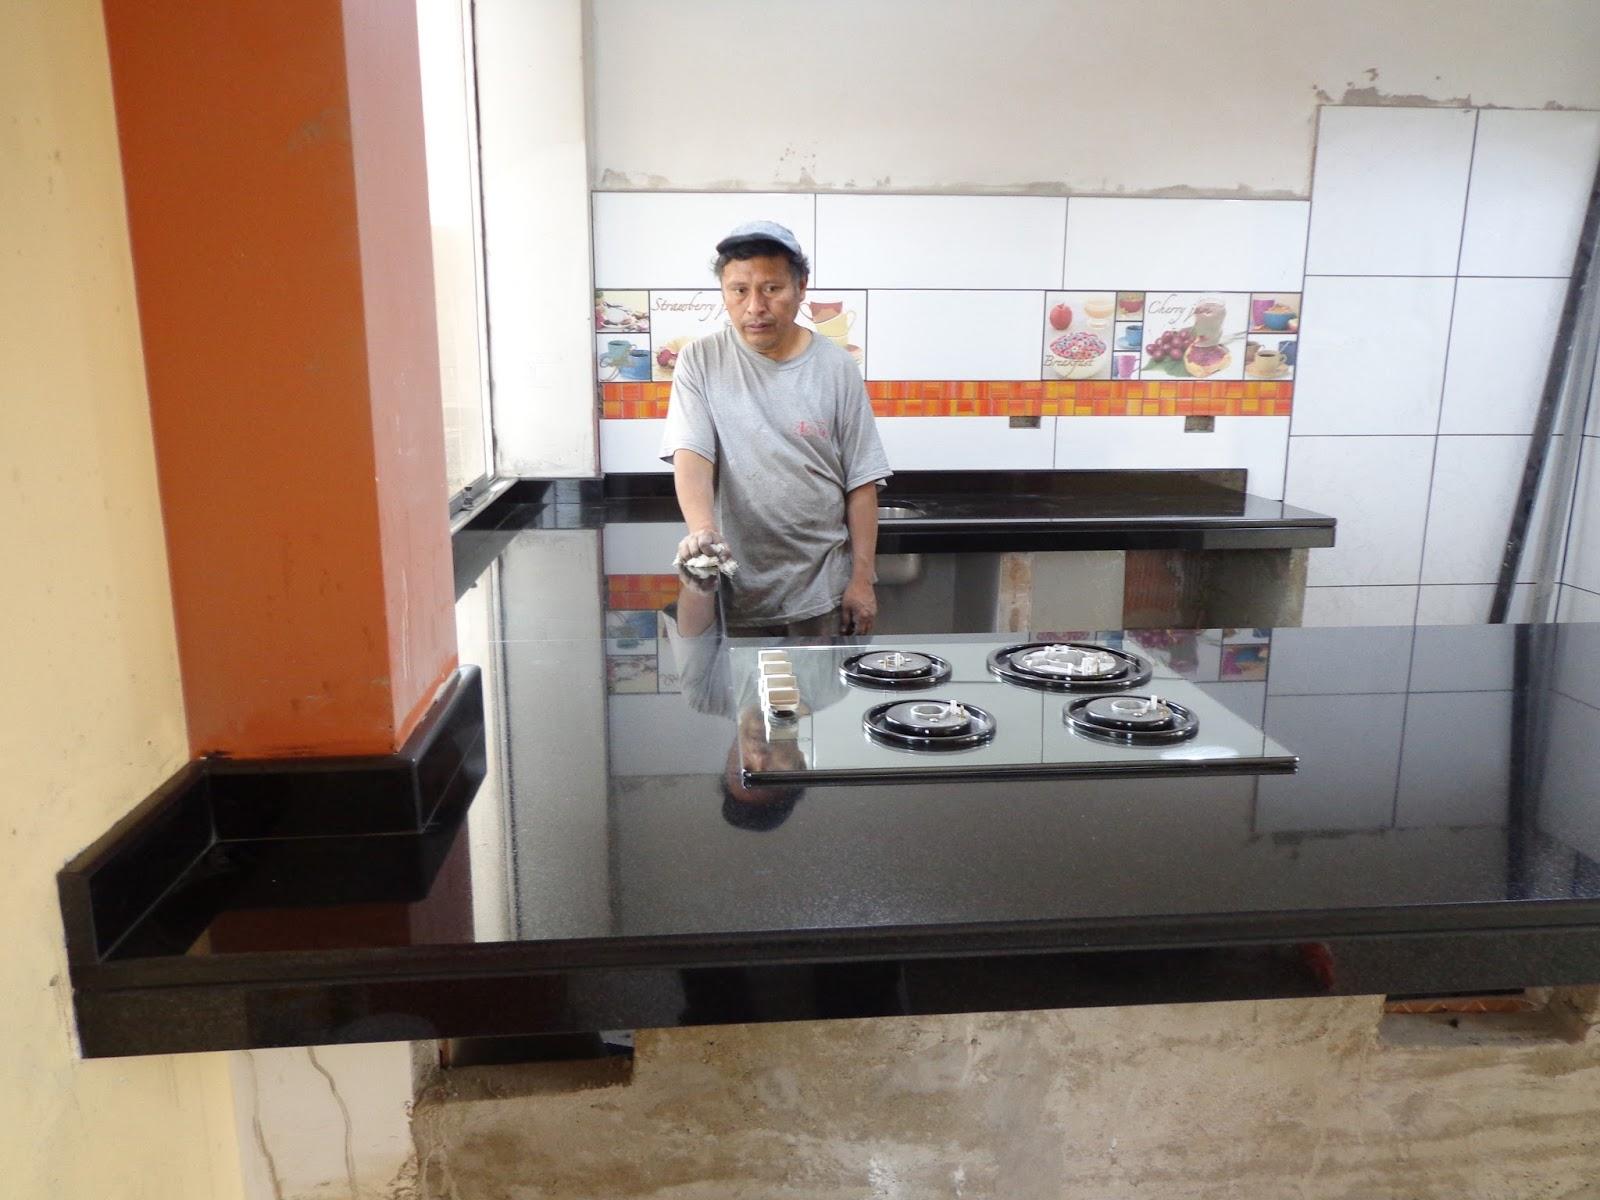 Cocinas vitroceramicas empotradas granito marmol lima for Modelos de marmol para cocina